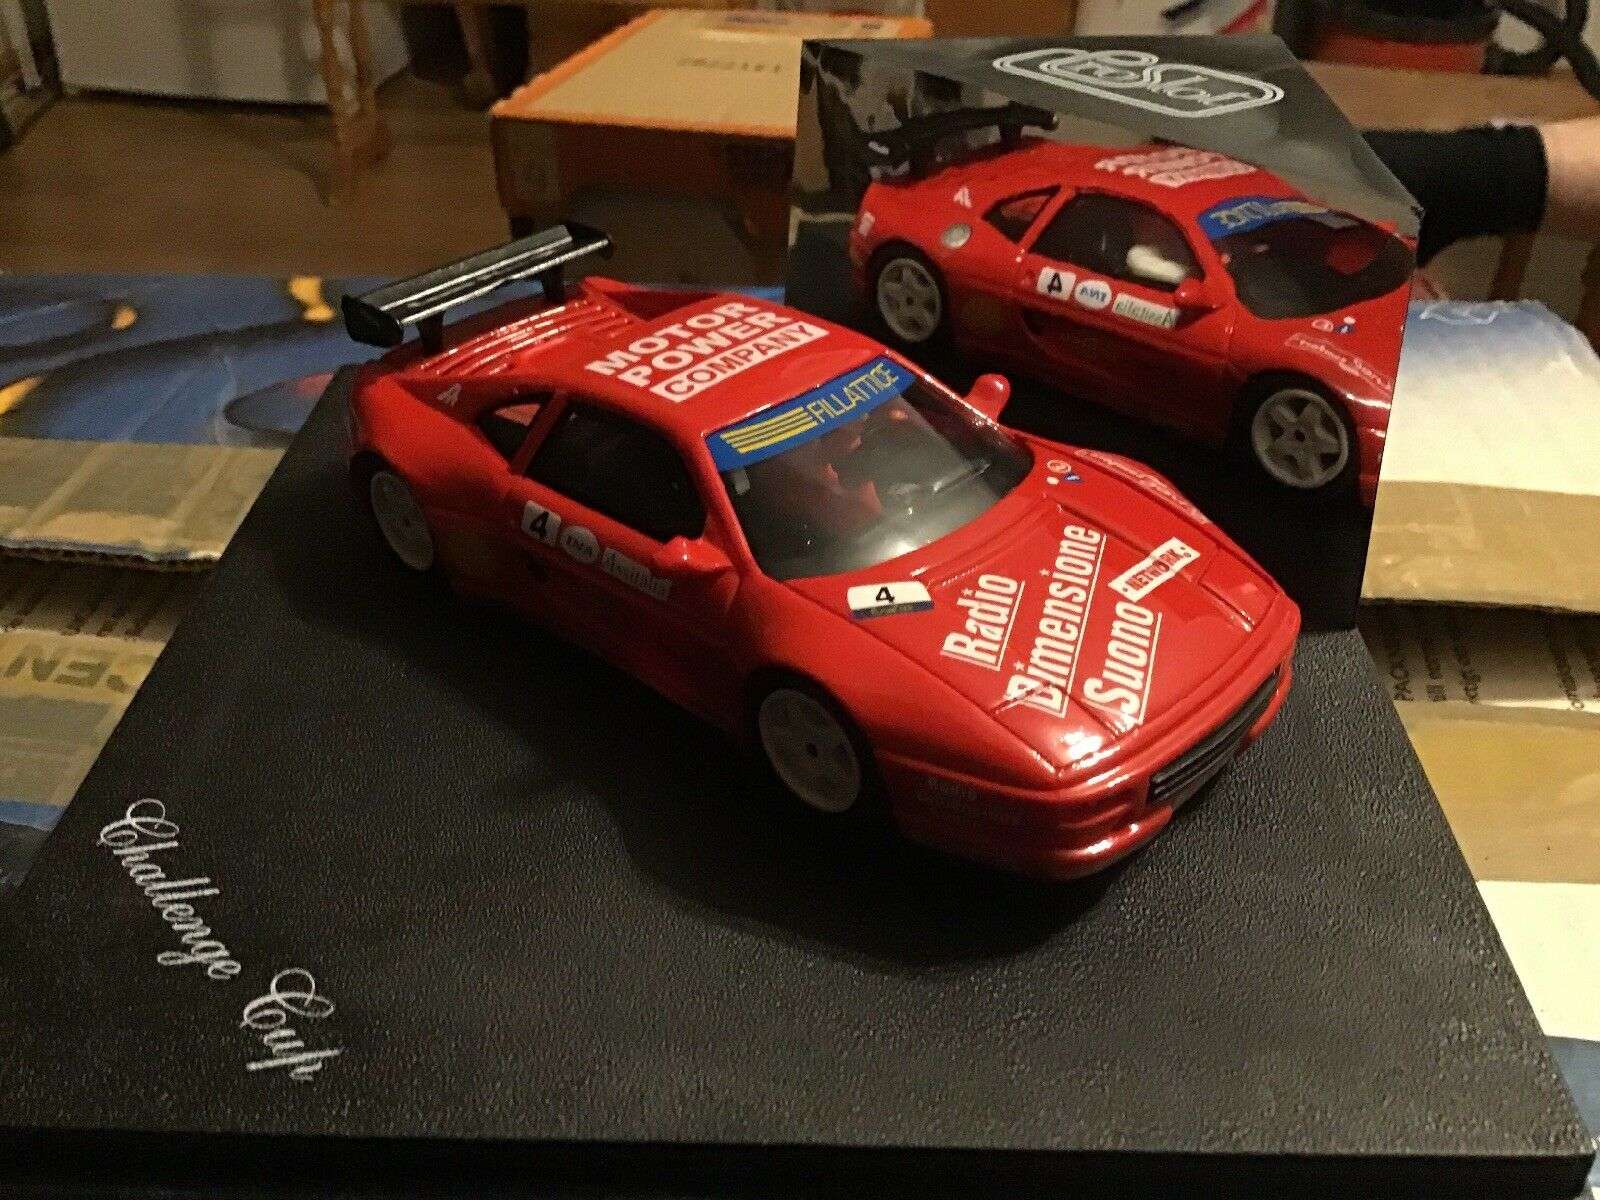 Pro Slot PS 1009 Ferrari  Challenge Cup 1 32